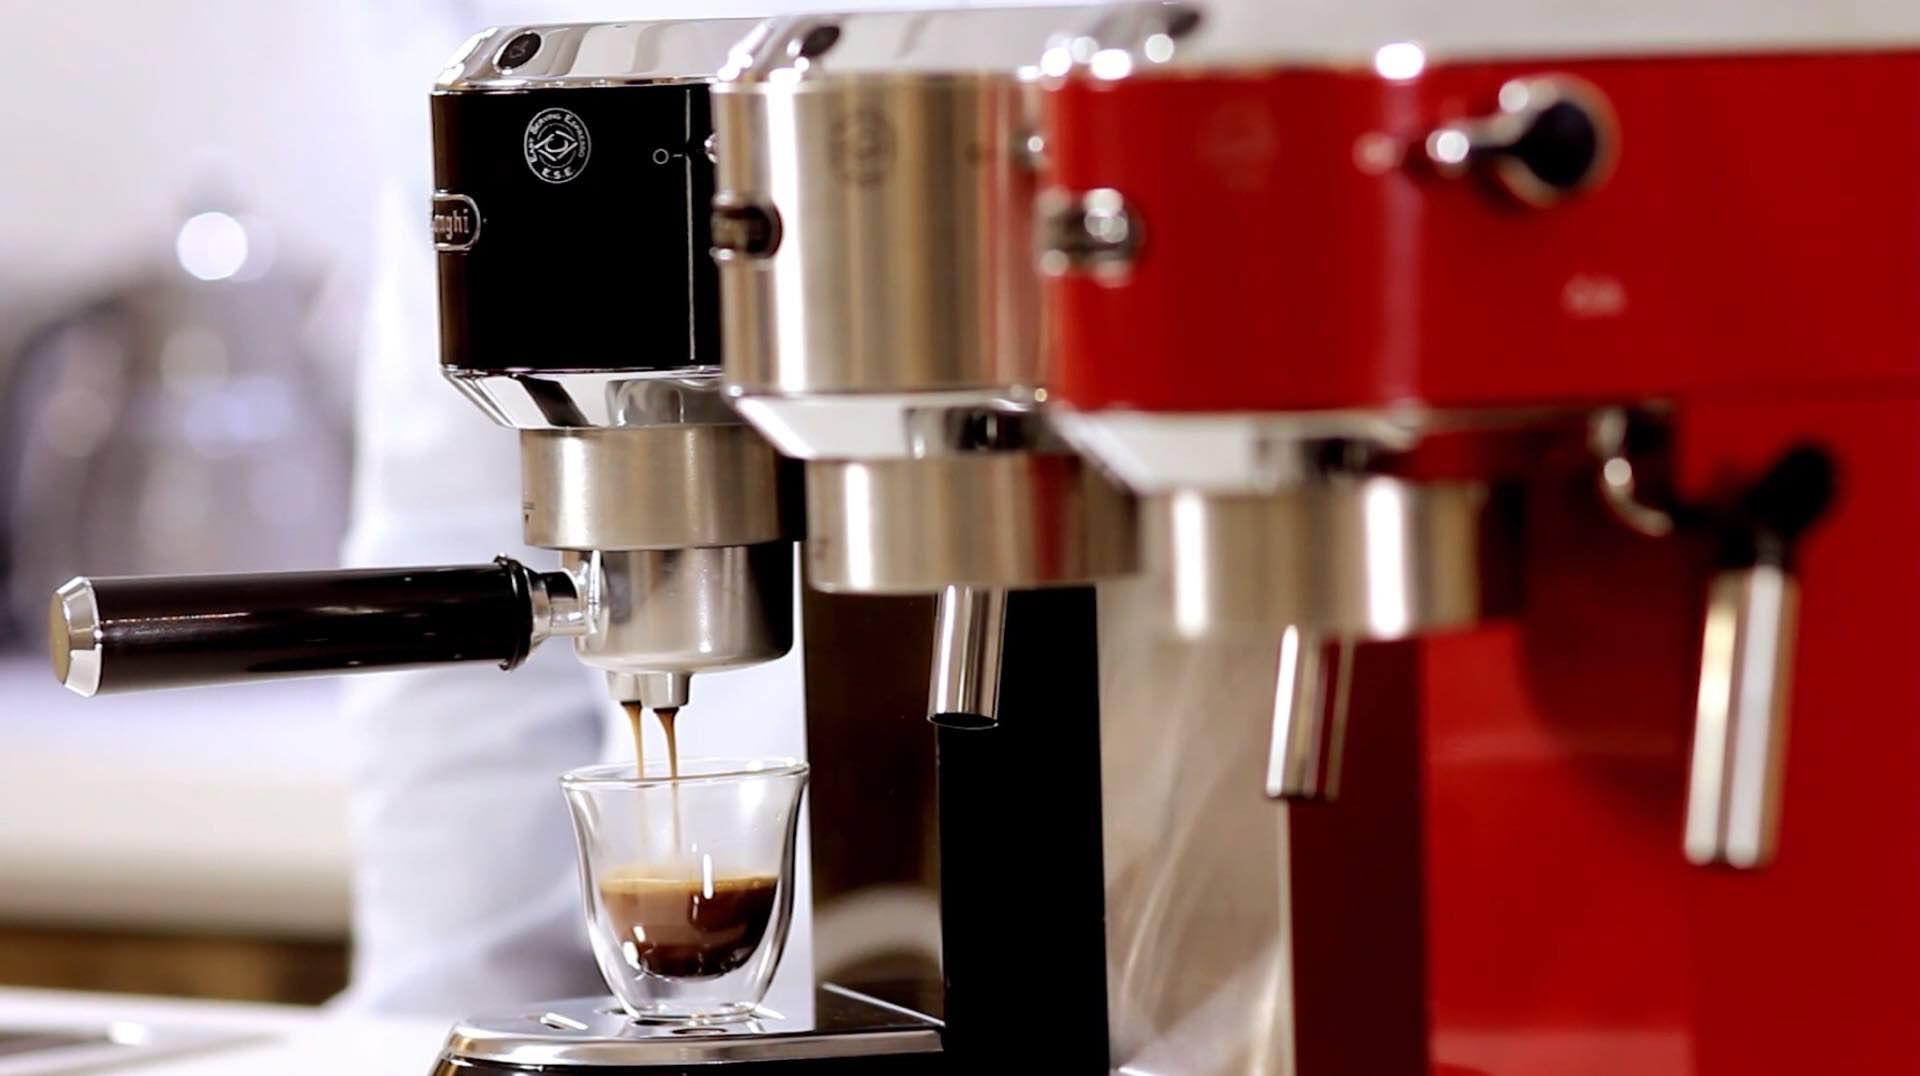 The De'Longhi Dedica EC685 espresso machine. (around $290–$293)